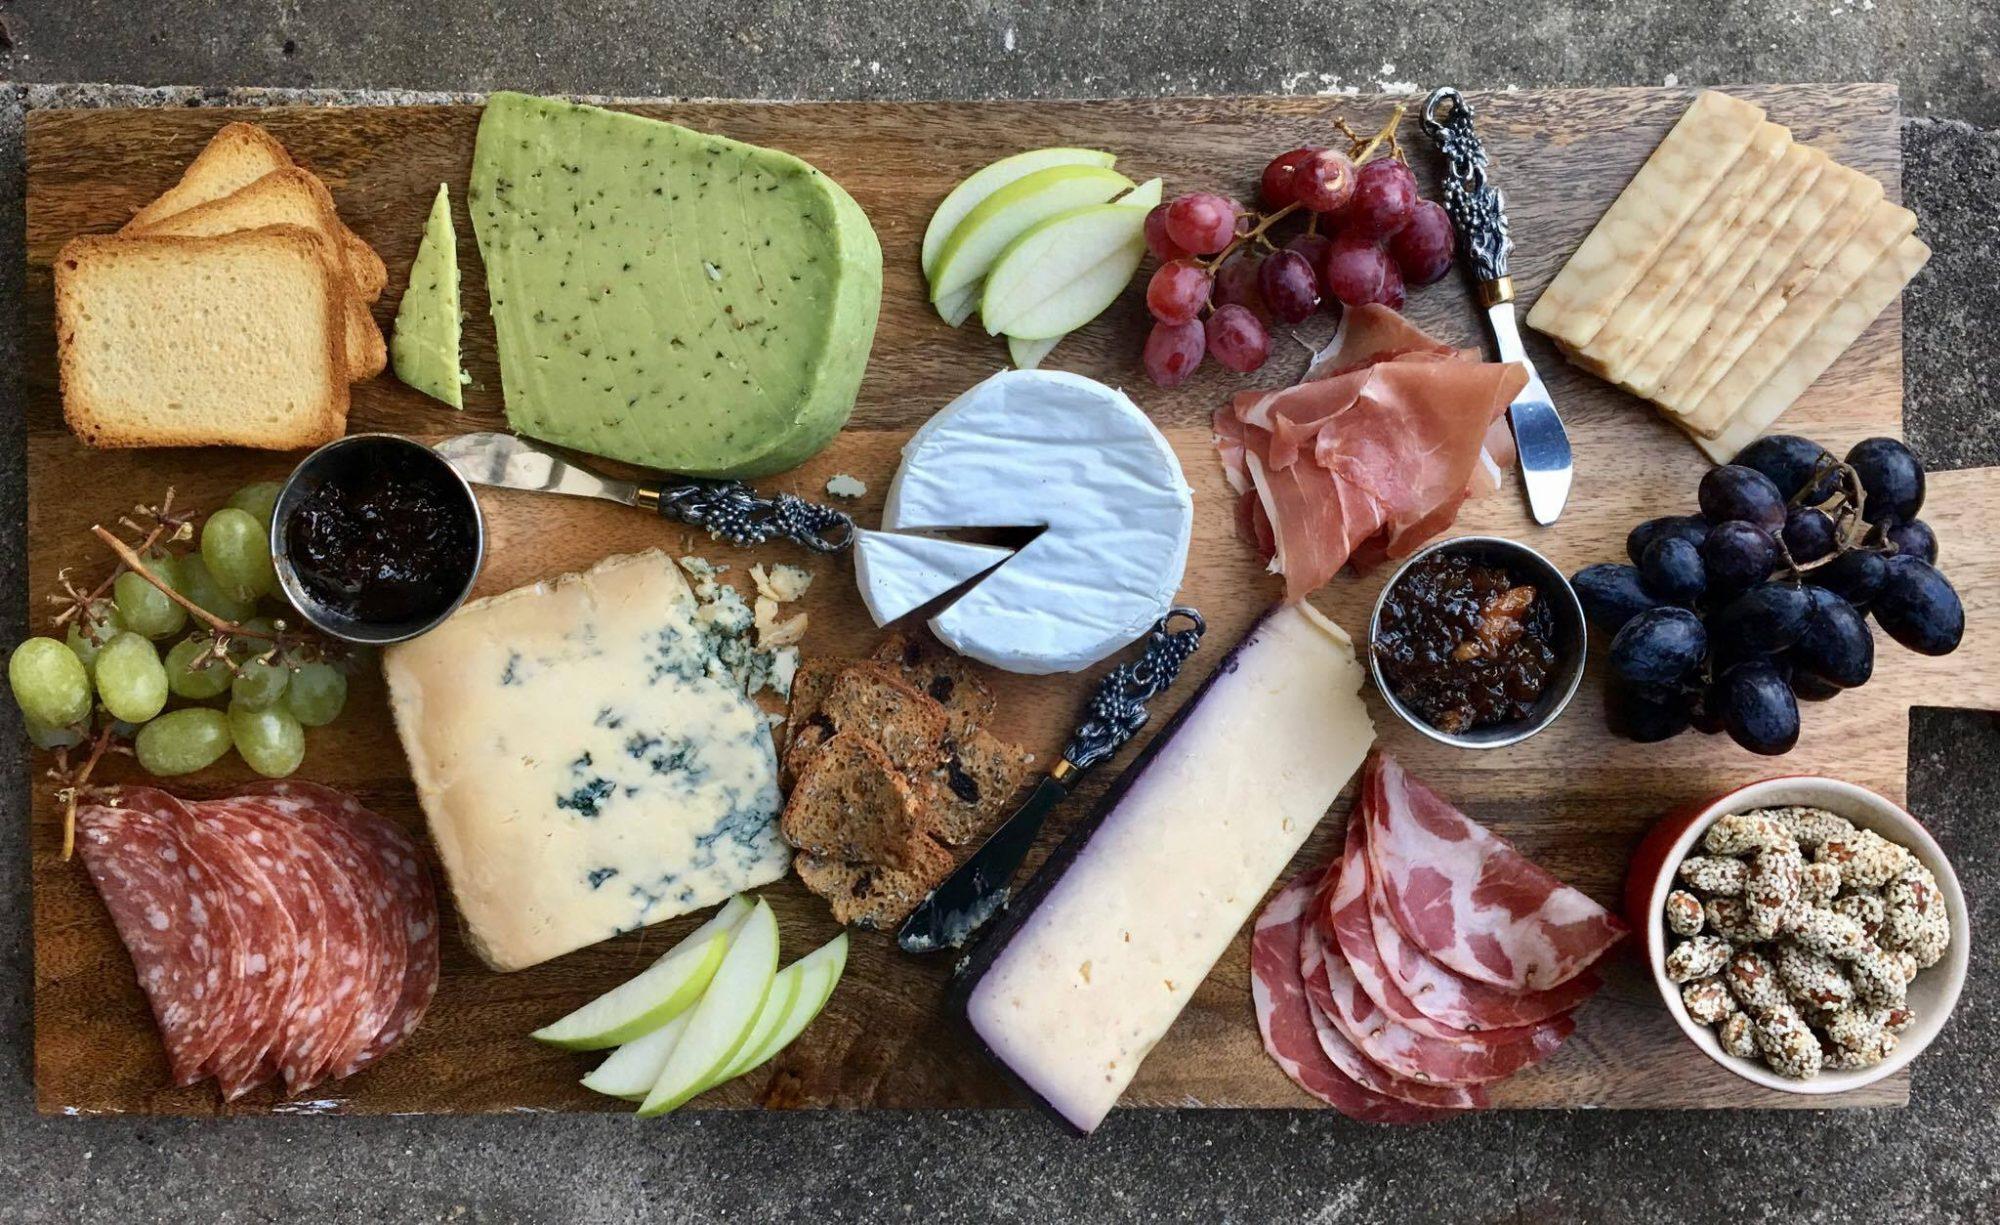 trader-joes-cheese-board-1